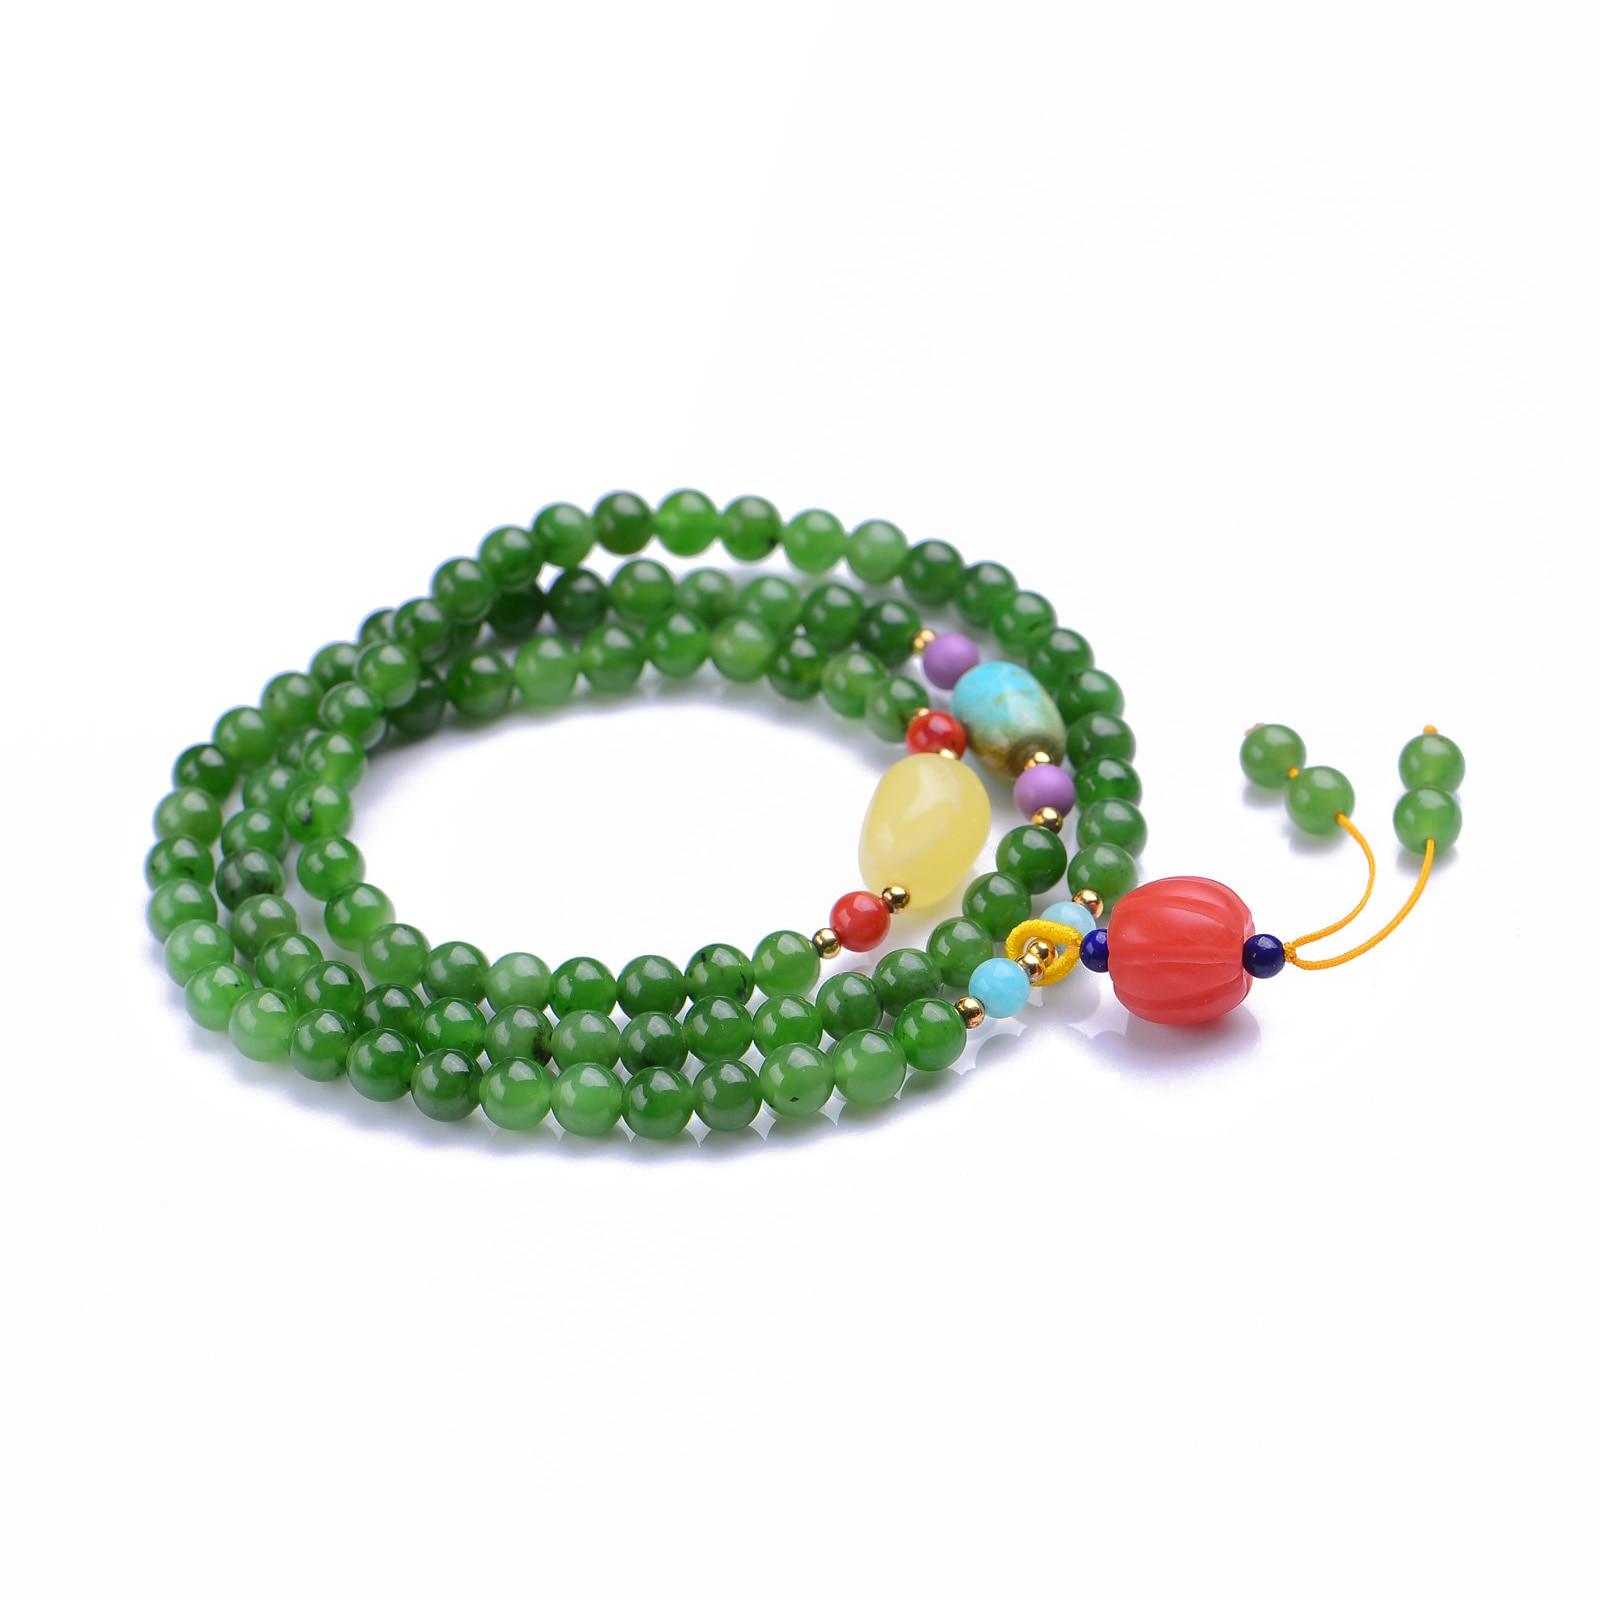 Handmade Authentic Green Crystal Bracelets 5.8mm